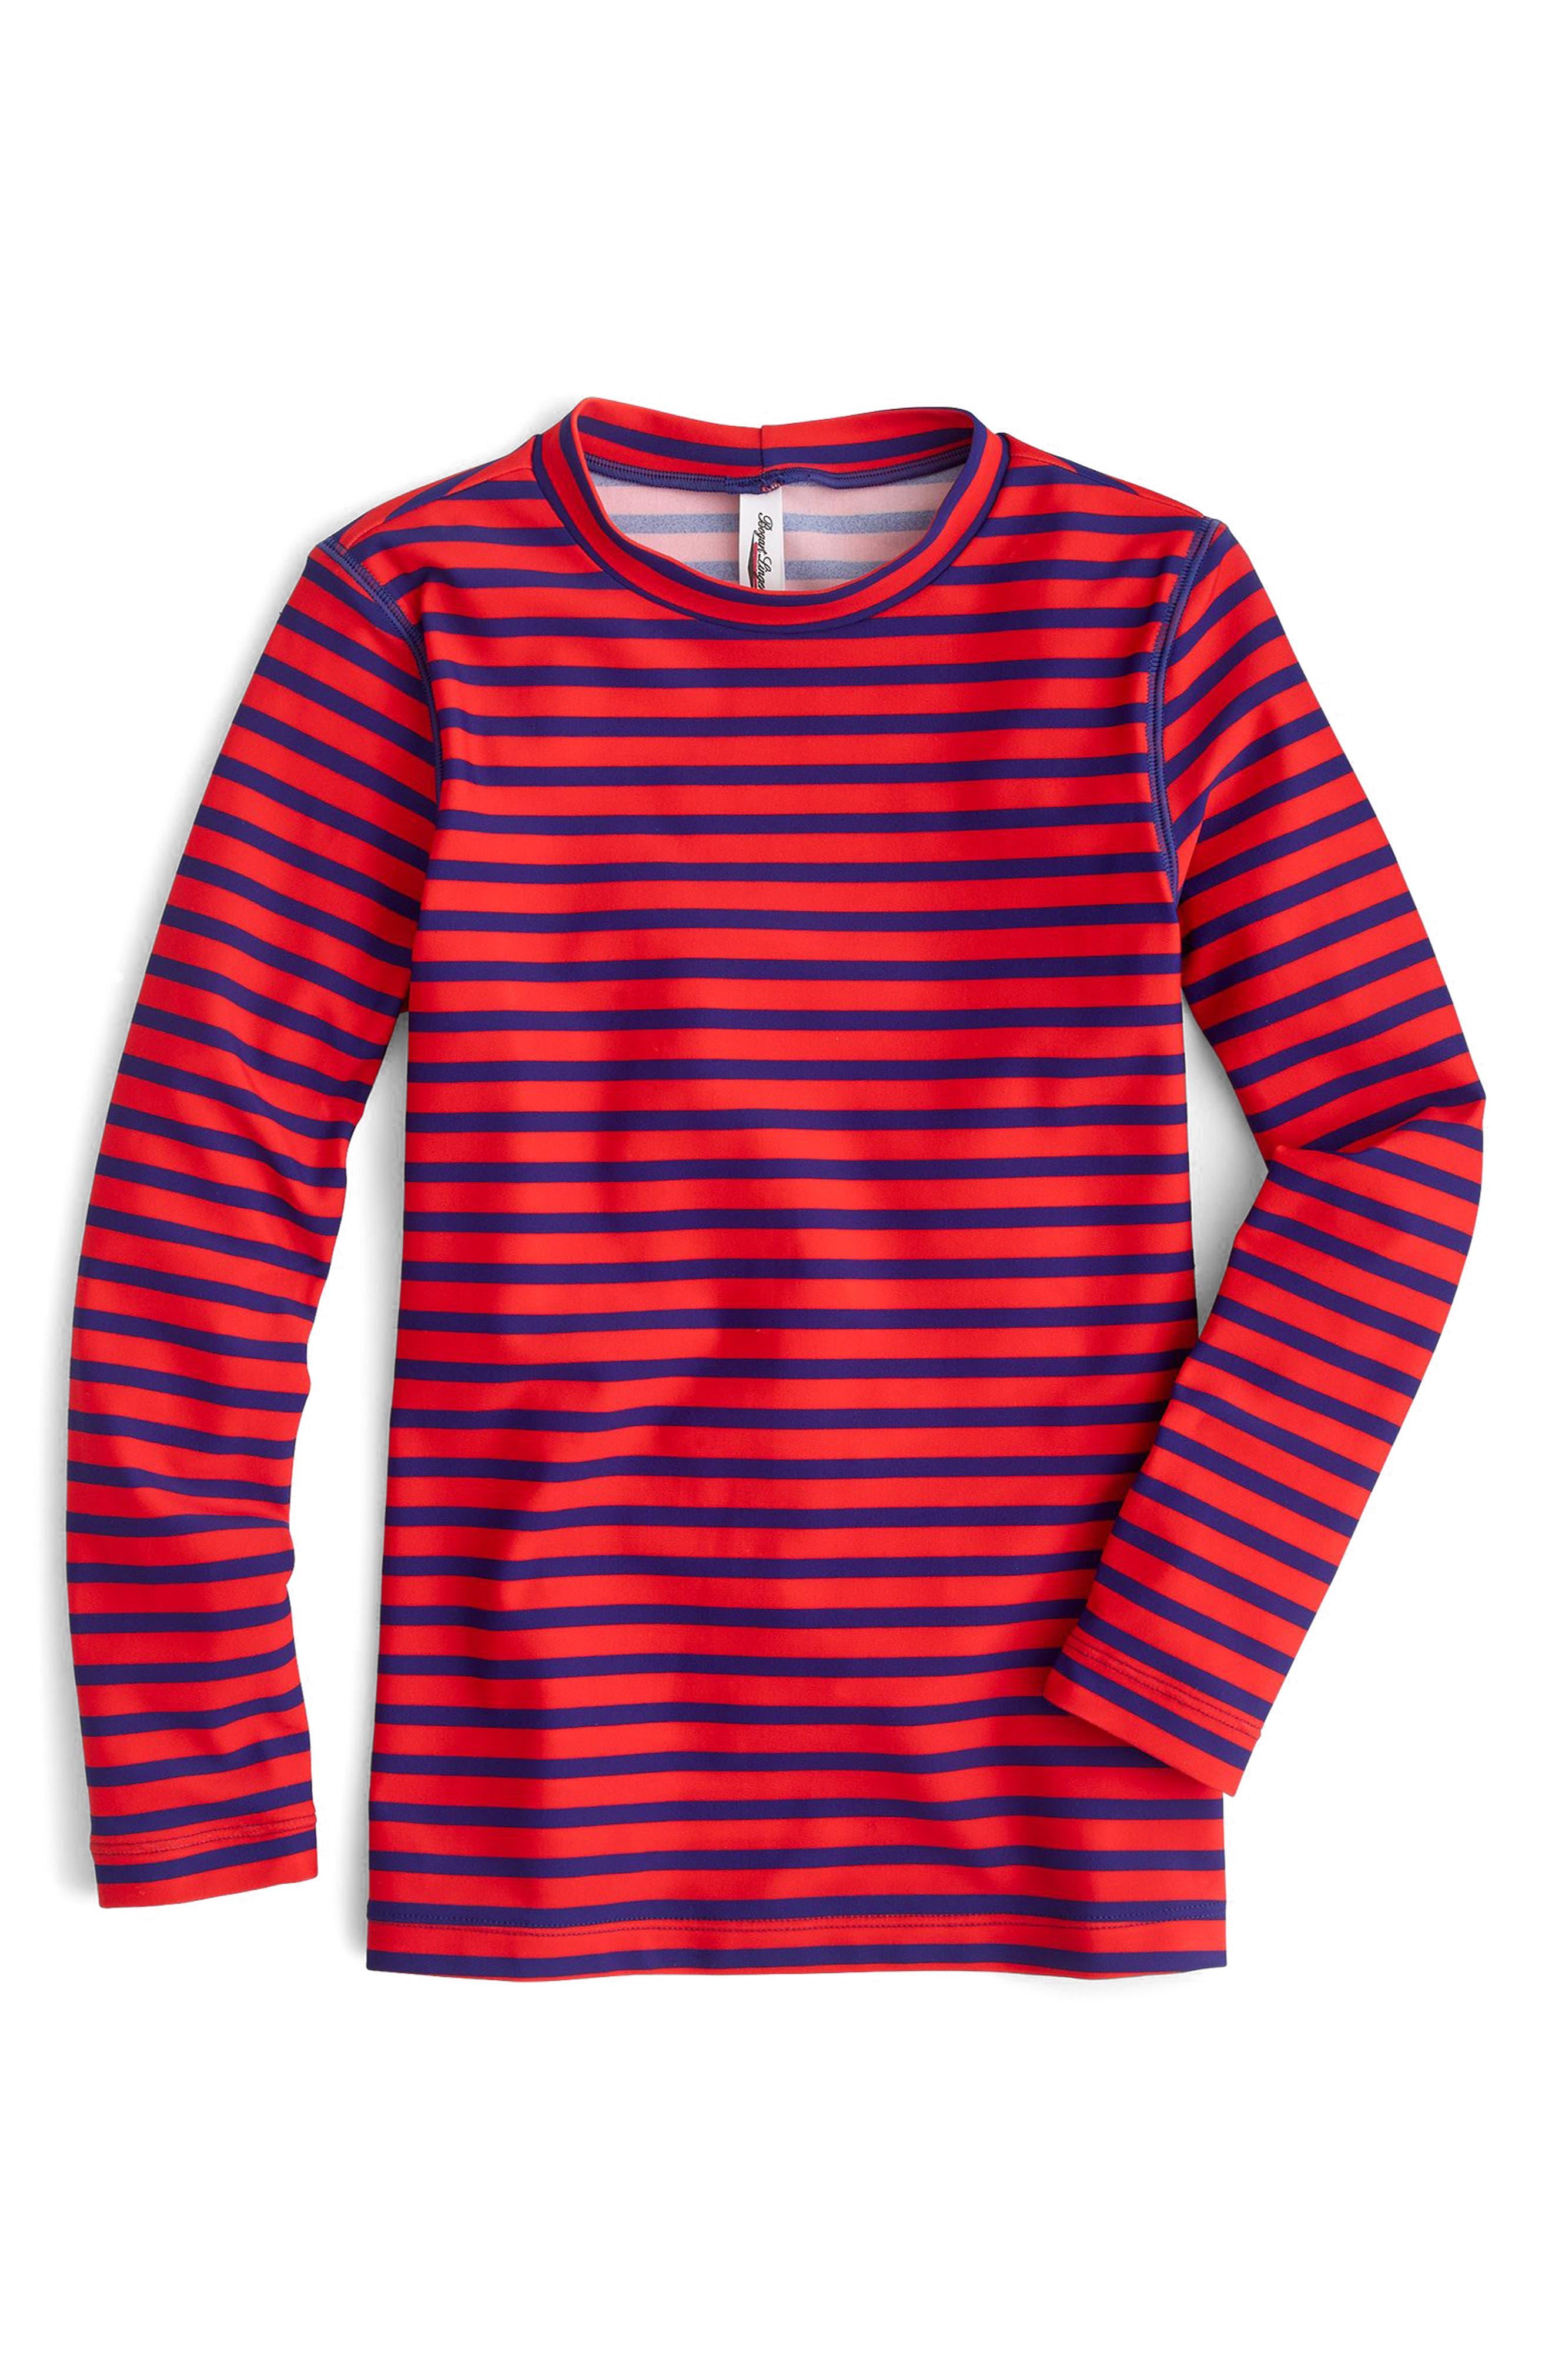 Stripe Long Sleeve Rashguard,                             Main thumbnail 1, color,